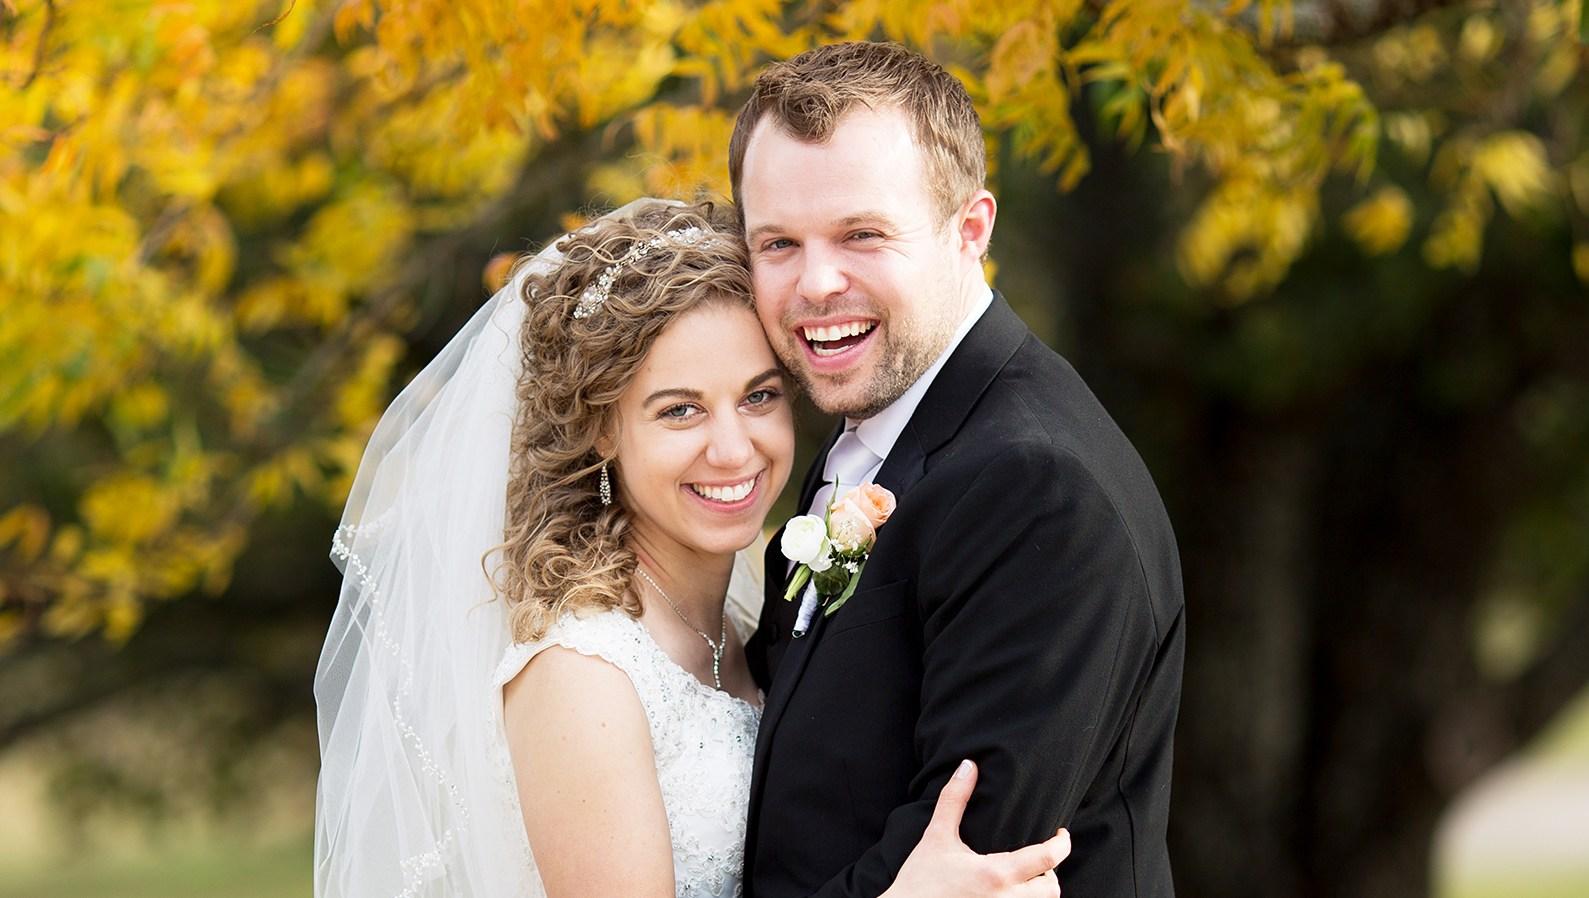 Abbie Grace Burnett John David Duggar Wedding